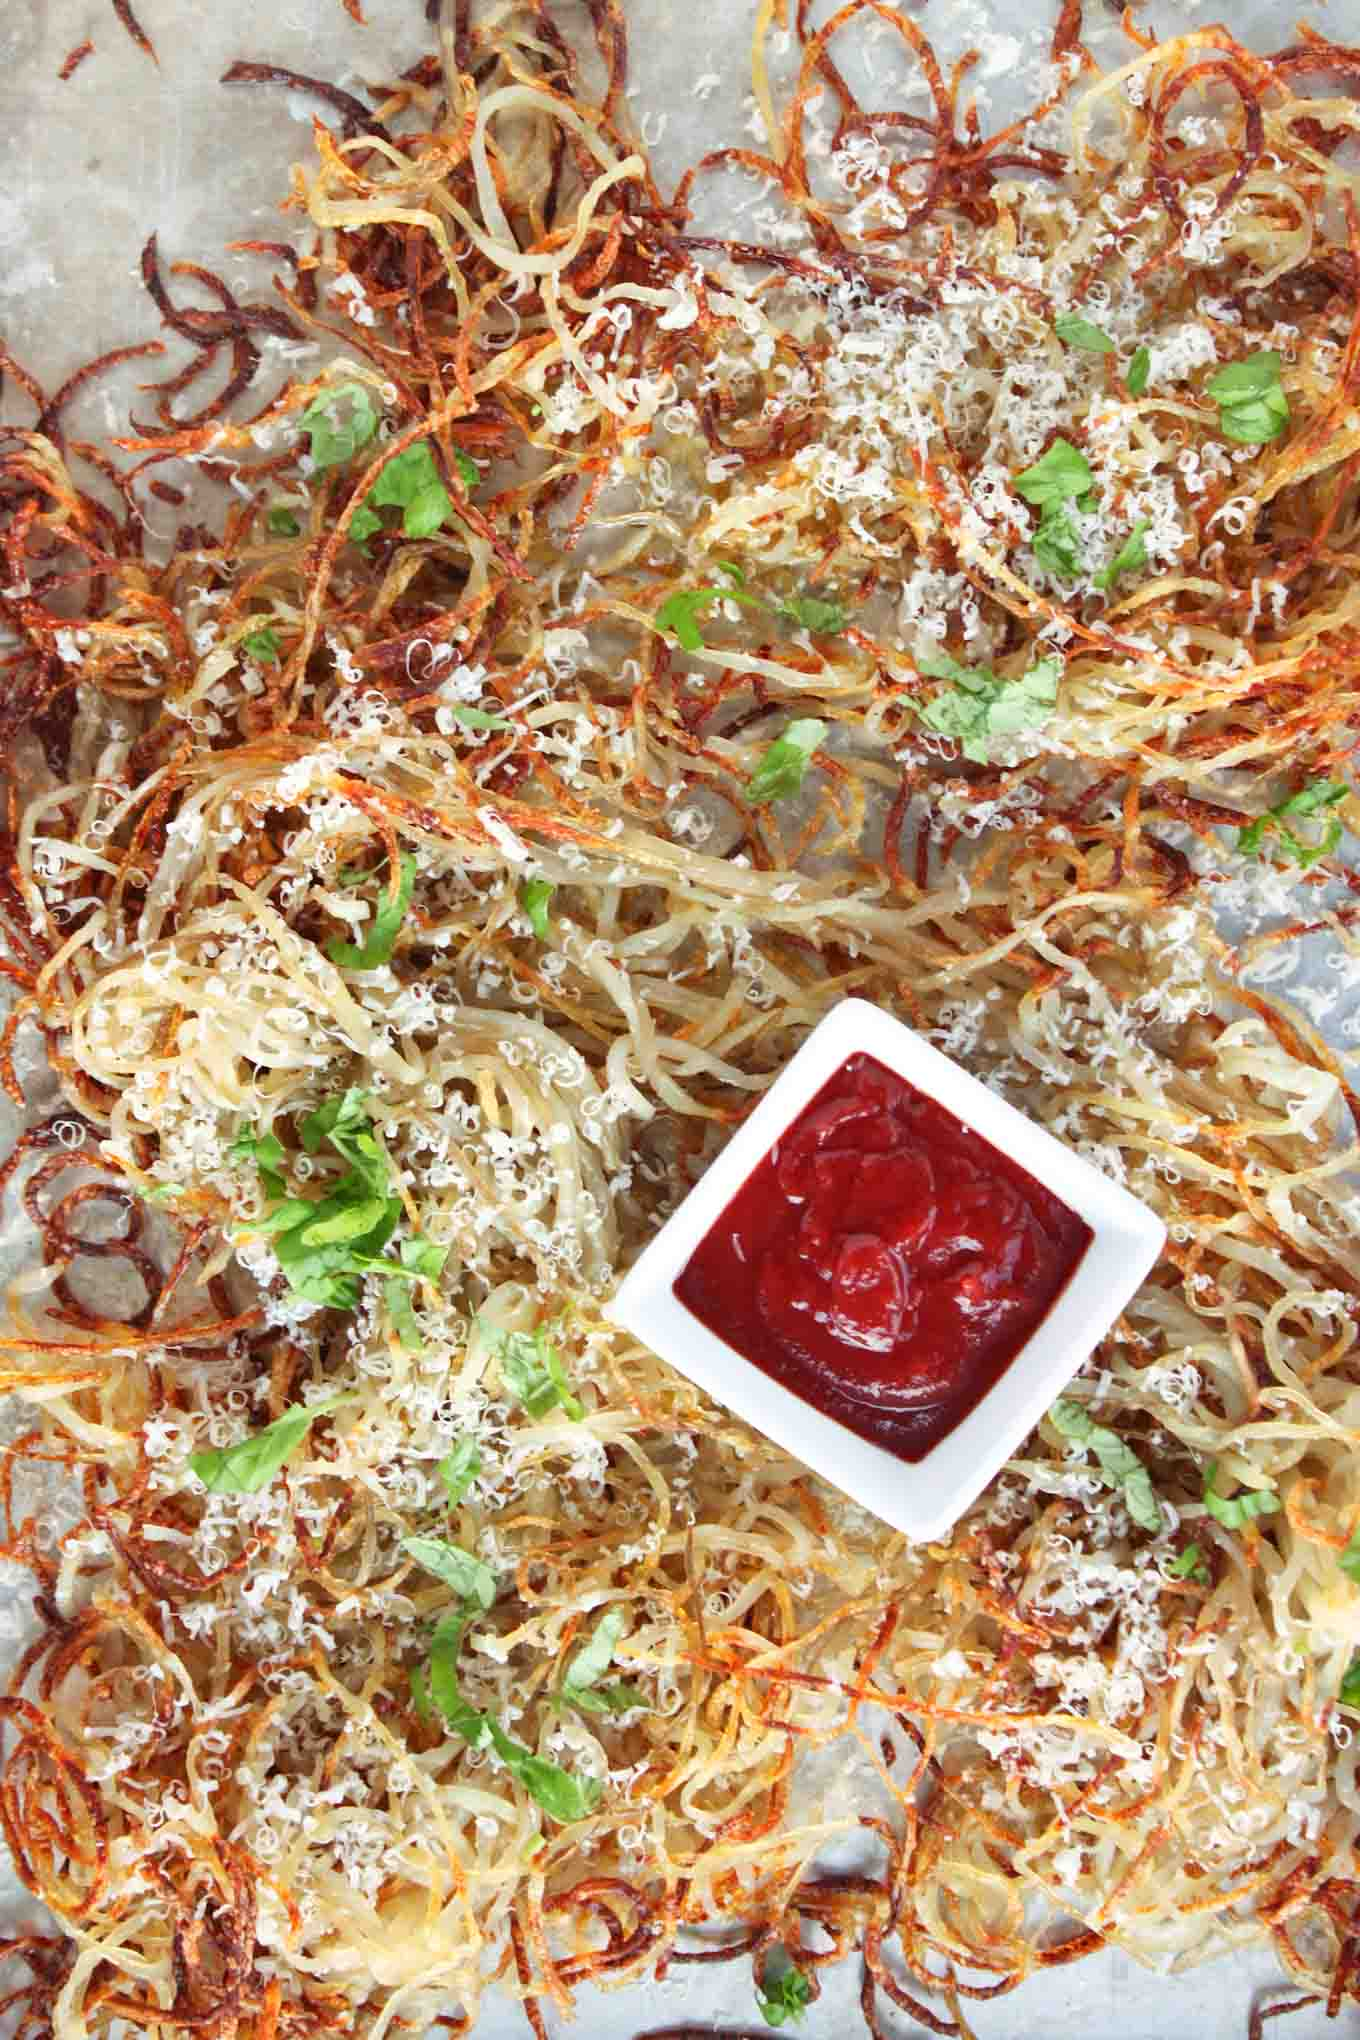 Oven Baked Basil Parmesan Shoestring Fries | simplerootswellness.com